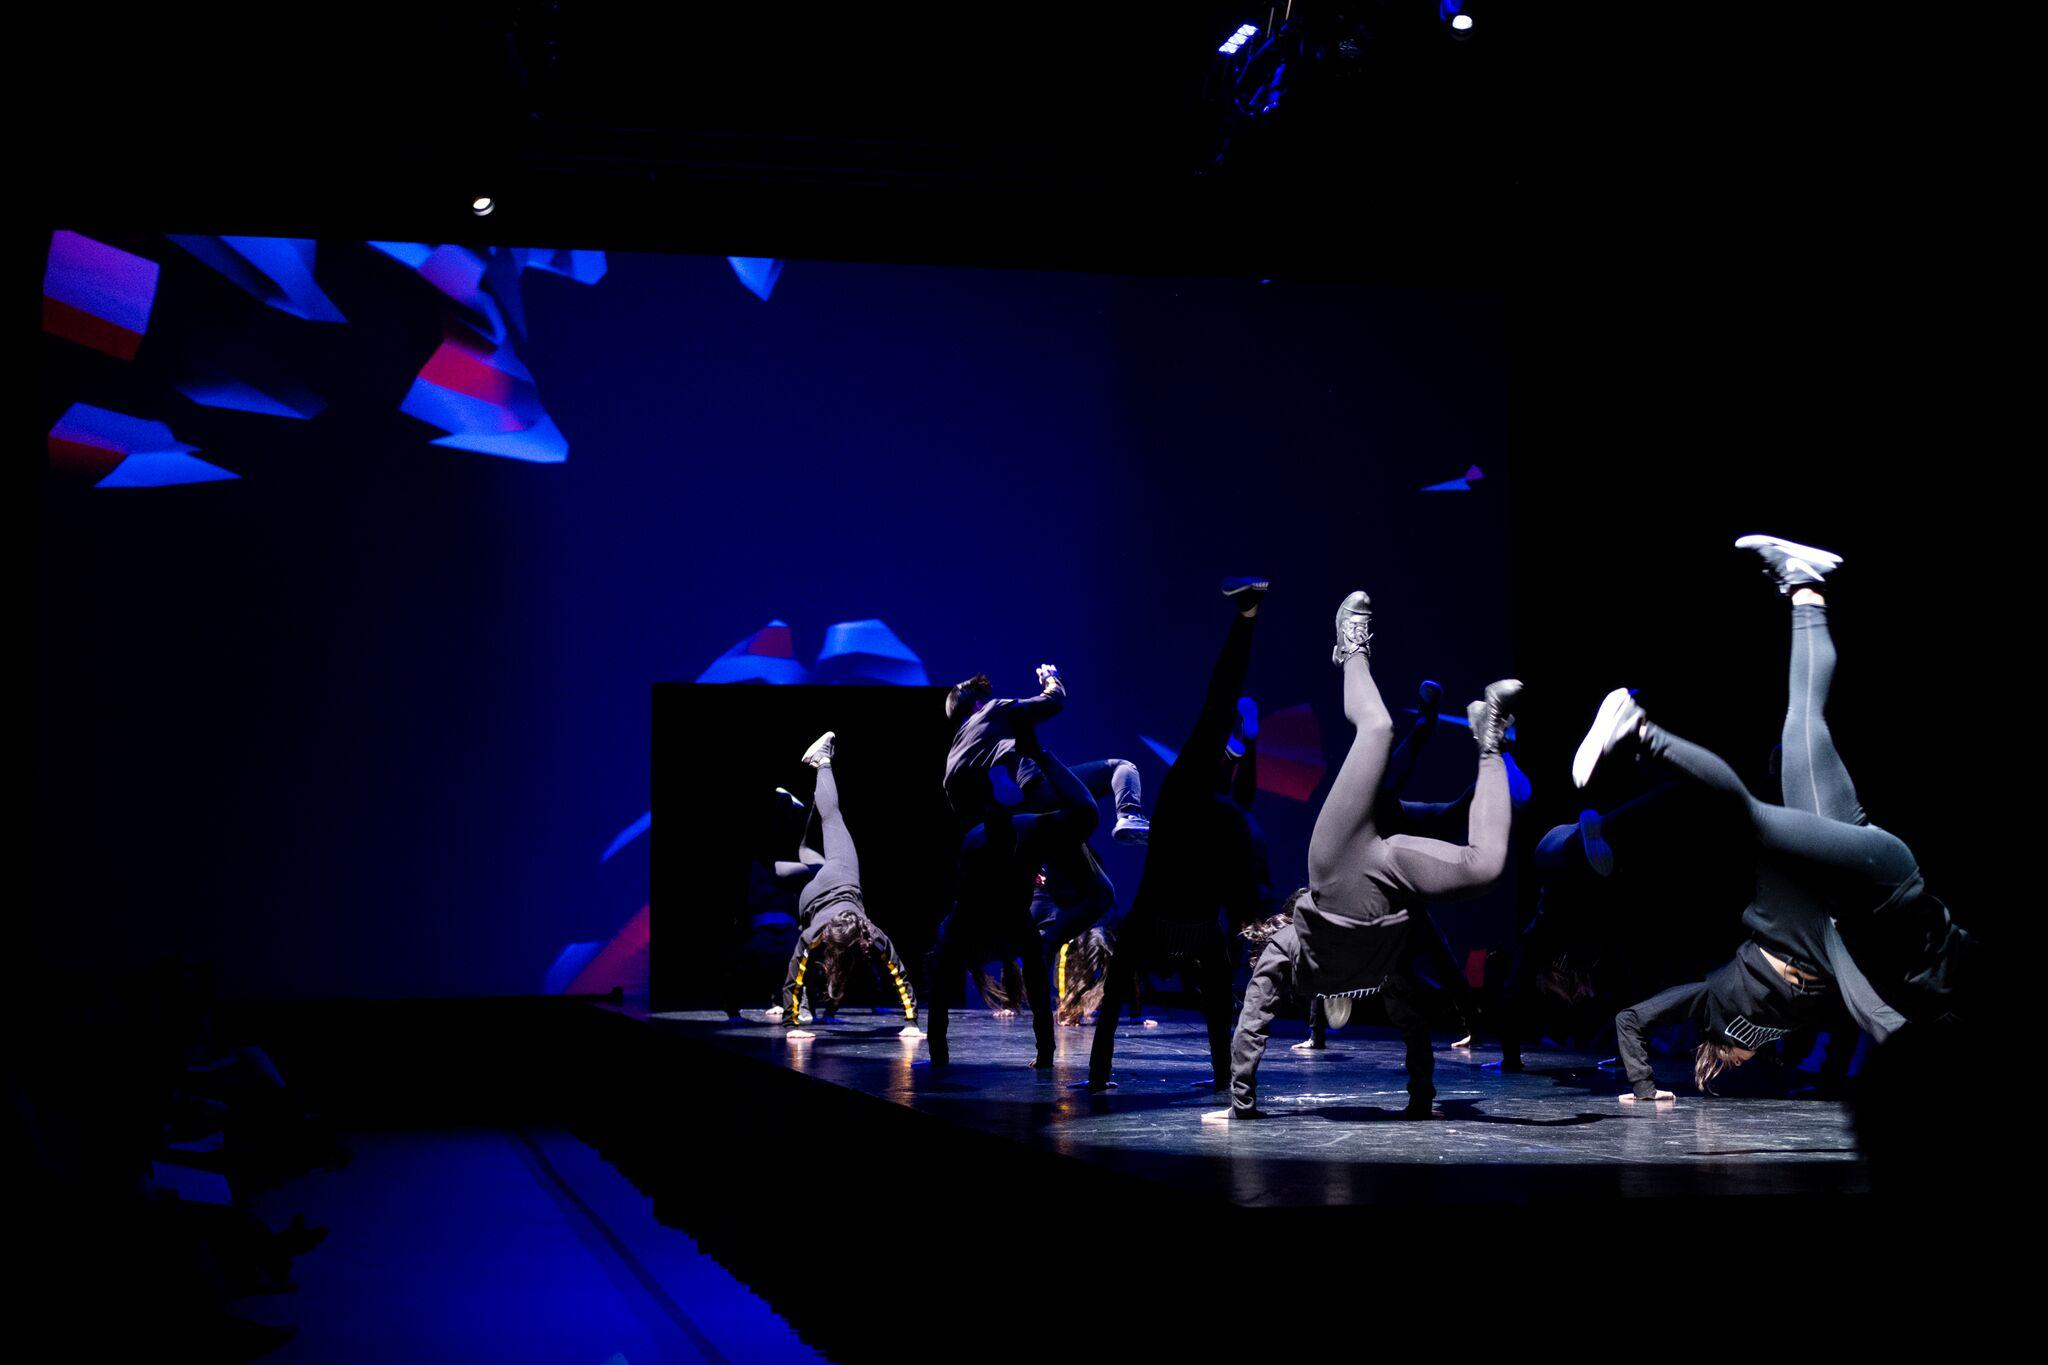 dance_screen_2.jpeg